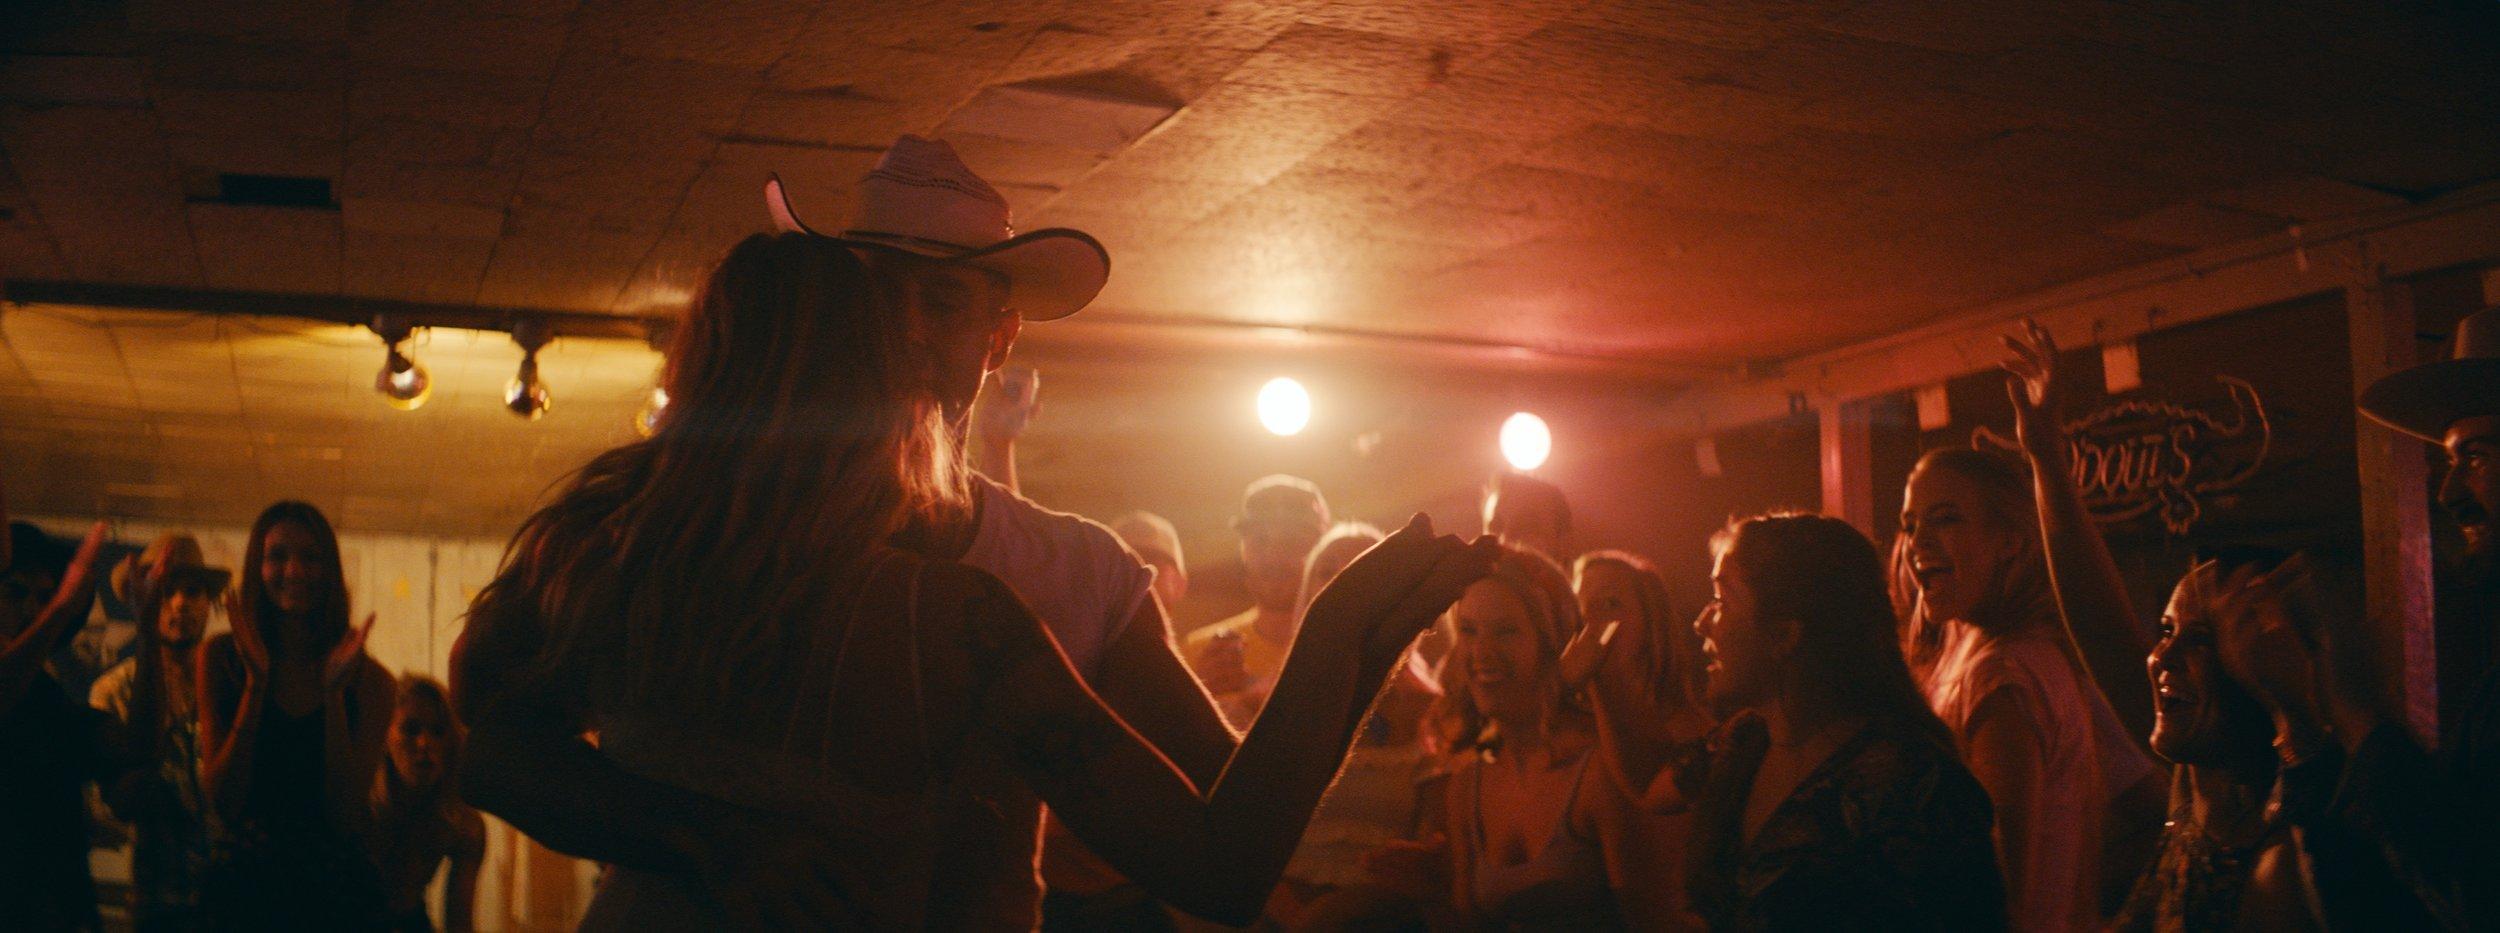 BS_Dance_BETTYBAR.jpg